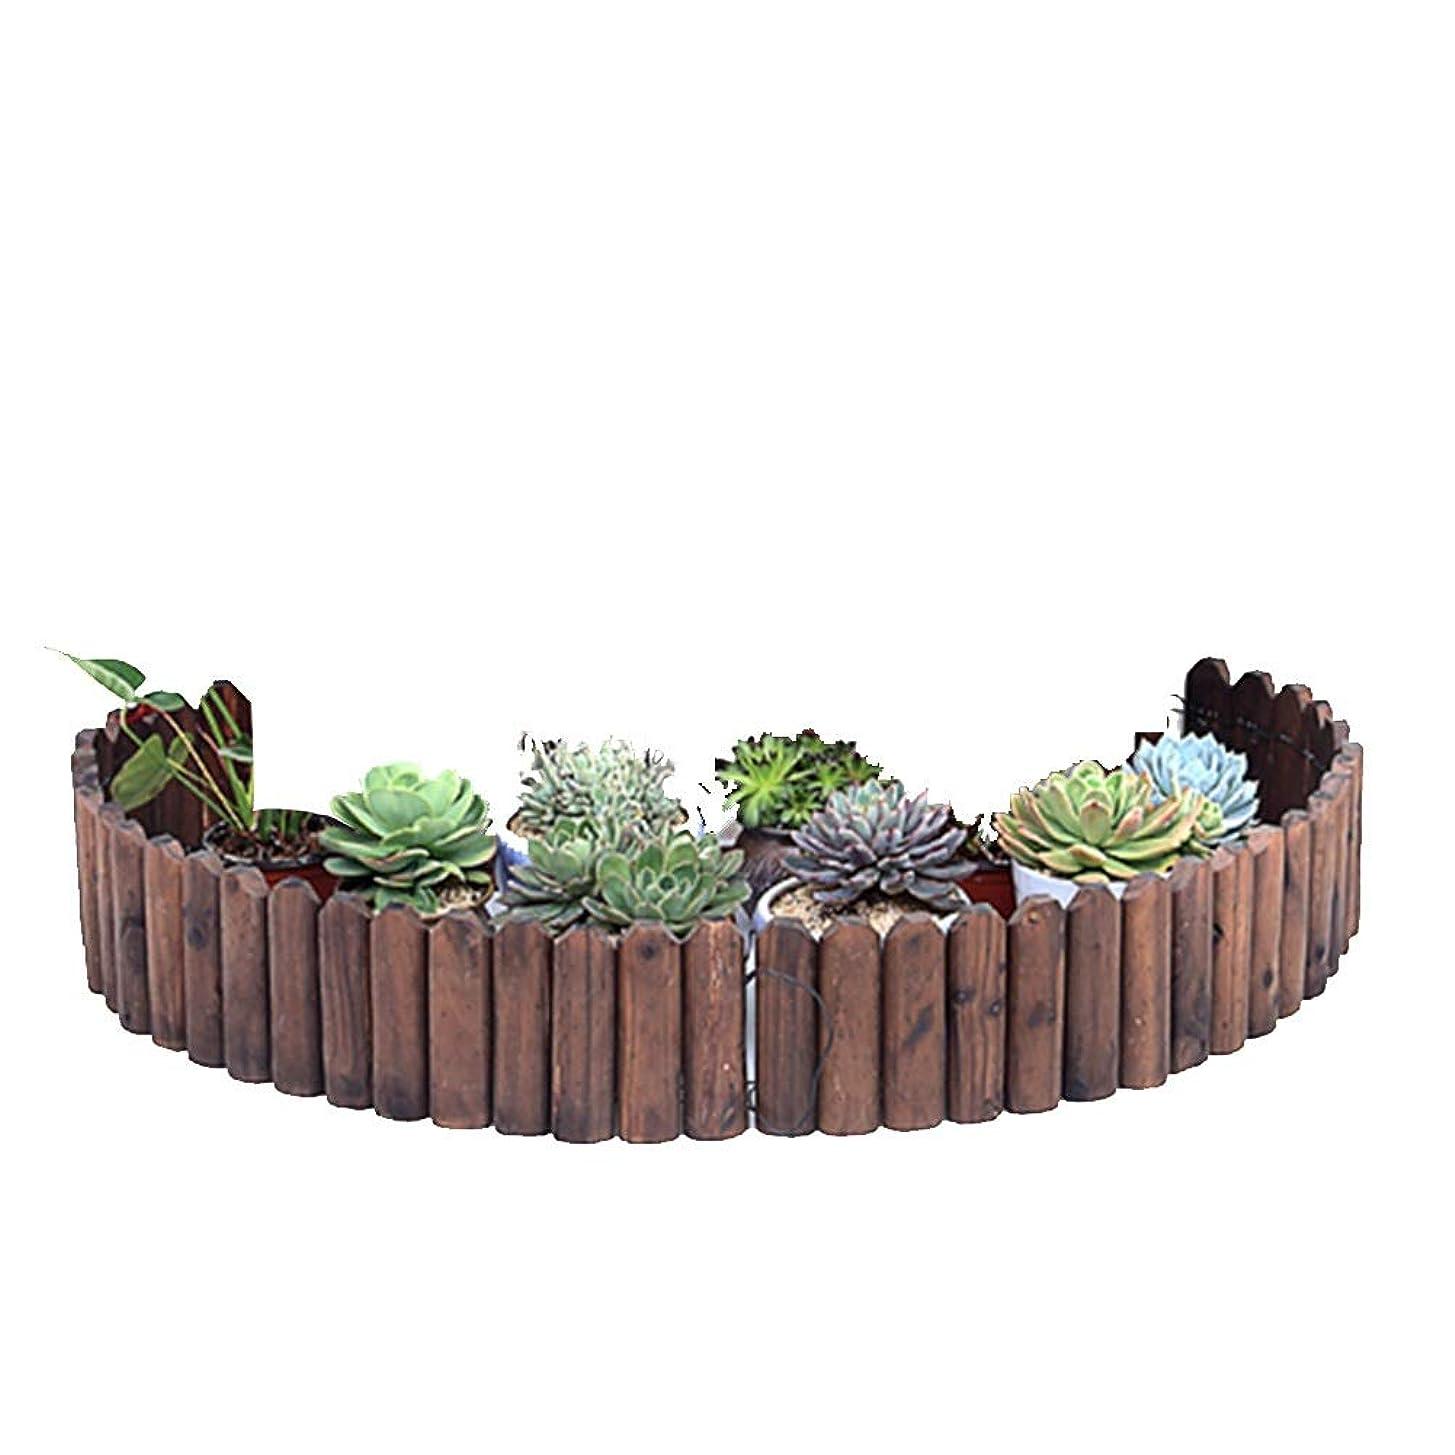 YYFANG 木製フェンス高温炭化耐候性含浸庭の芝生保護分割スペース自然モミ、5サイズ (Color : Brown, Size : 118x30cm)